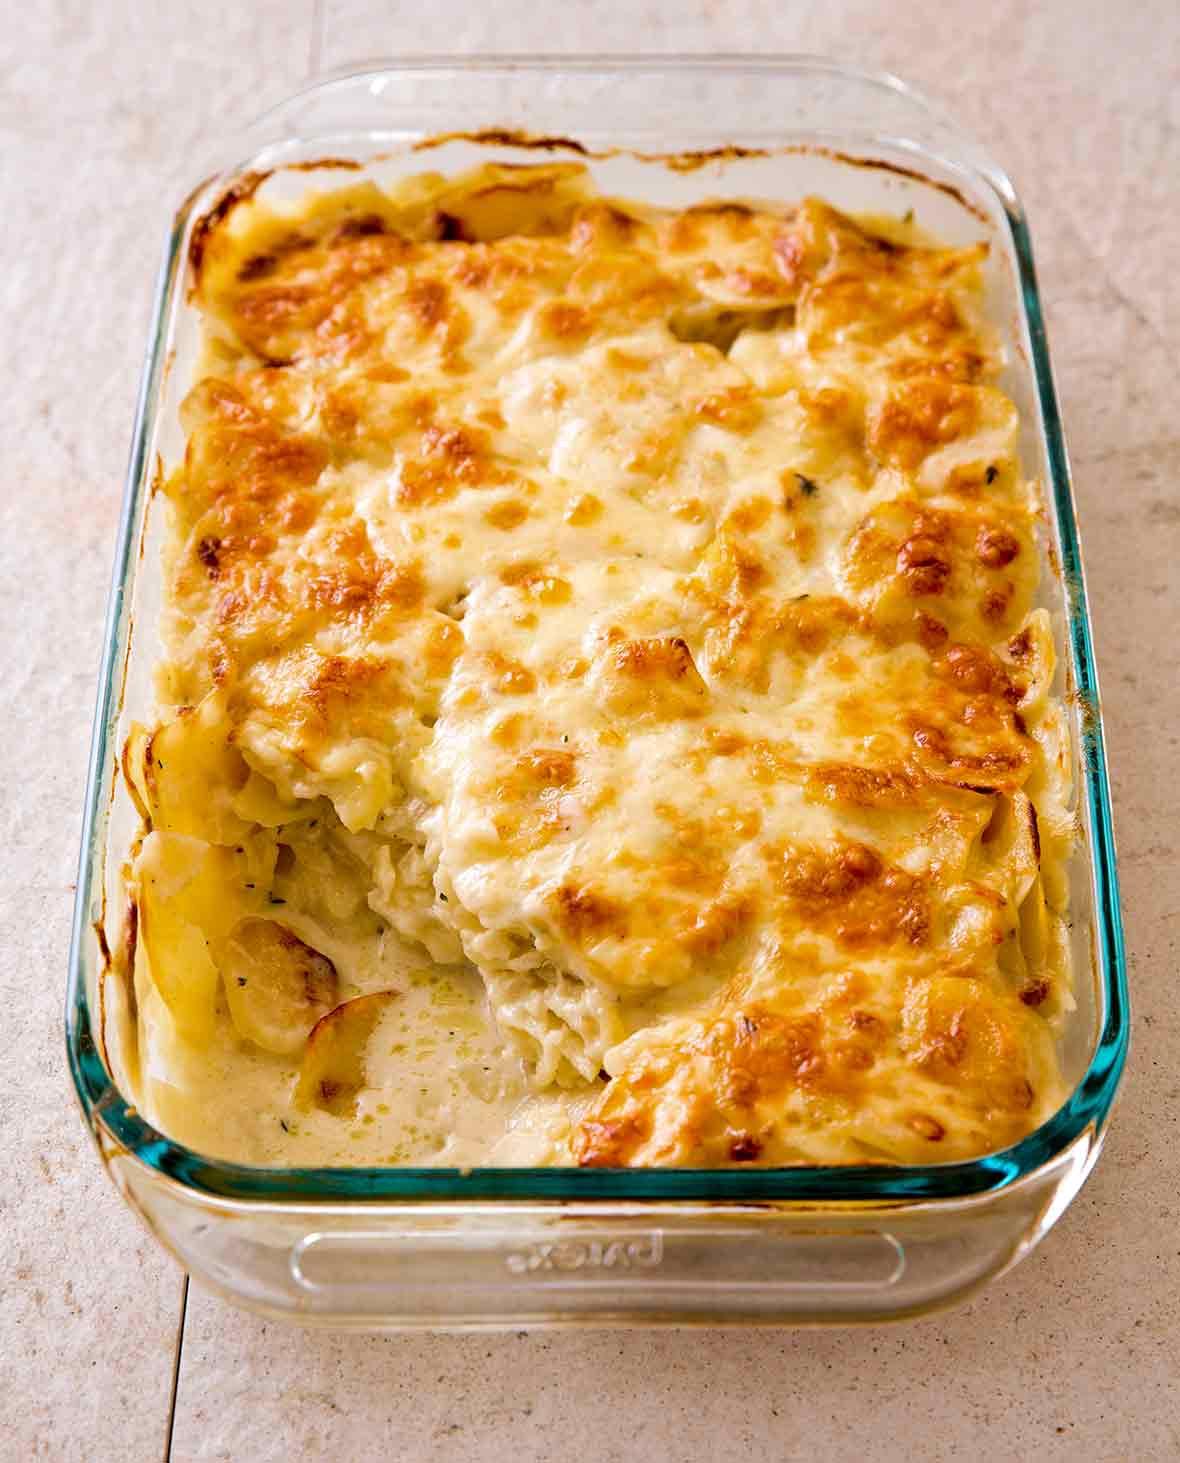 How To Make Scalloped Potatoes  Scalloped Potatoes Recipe